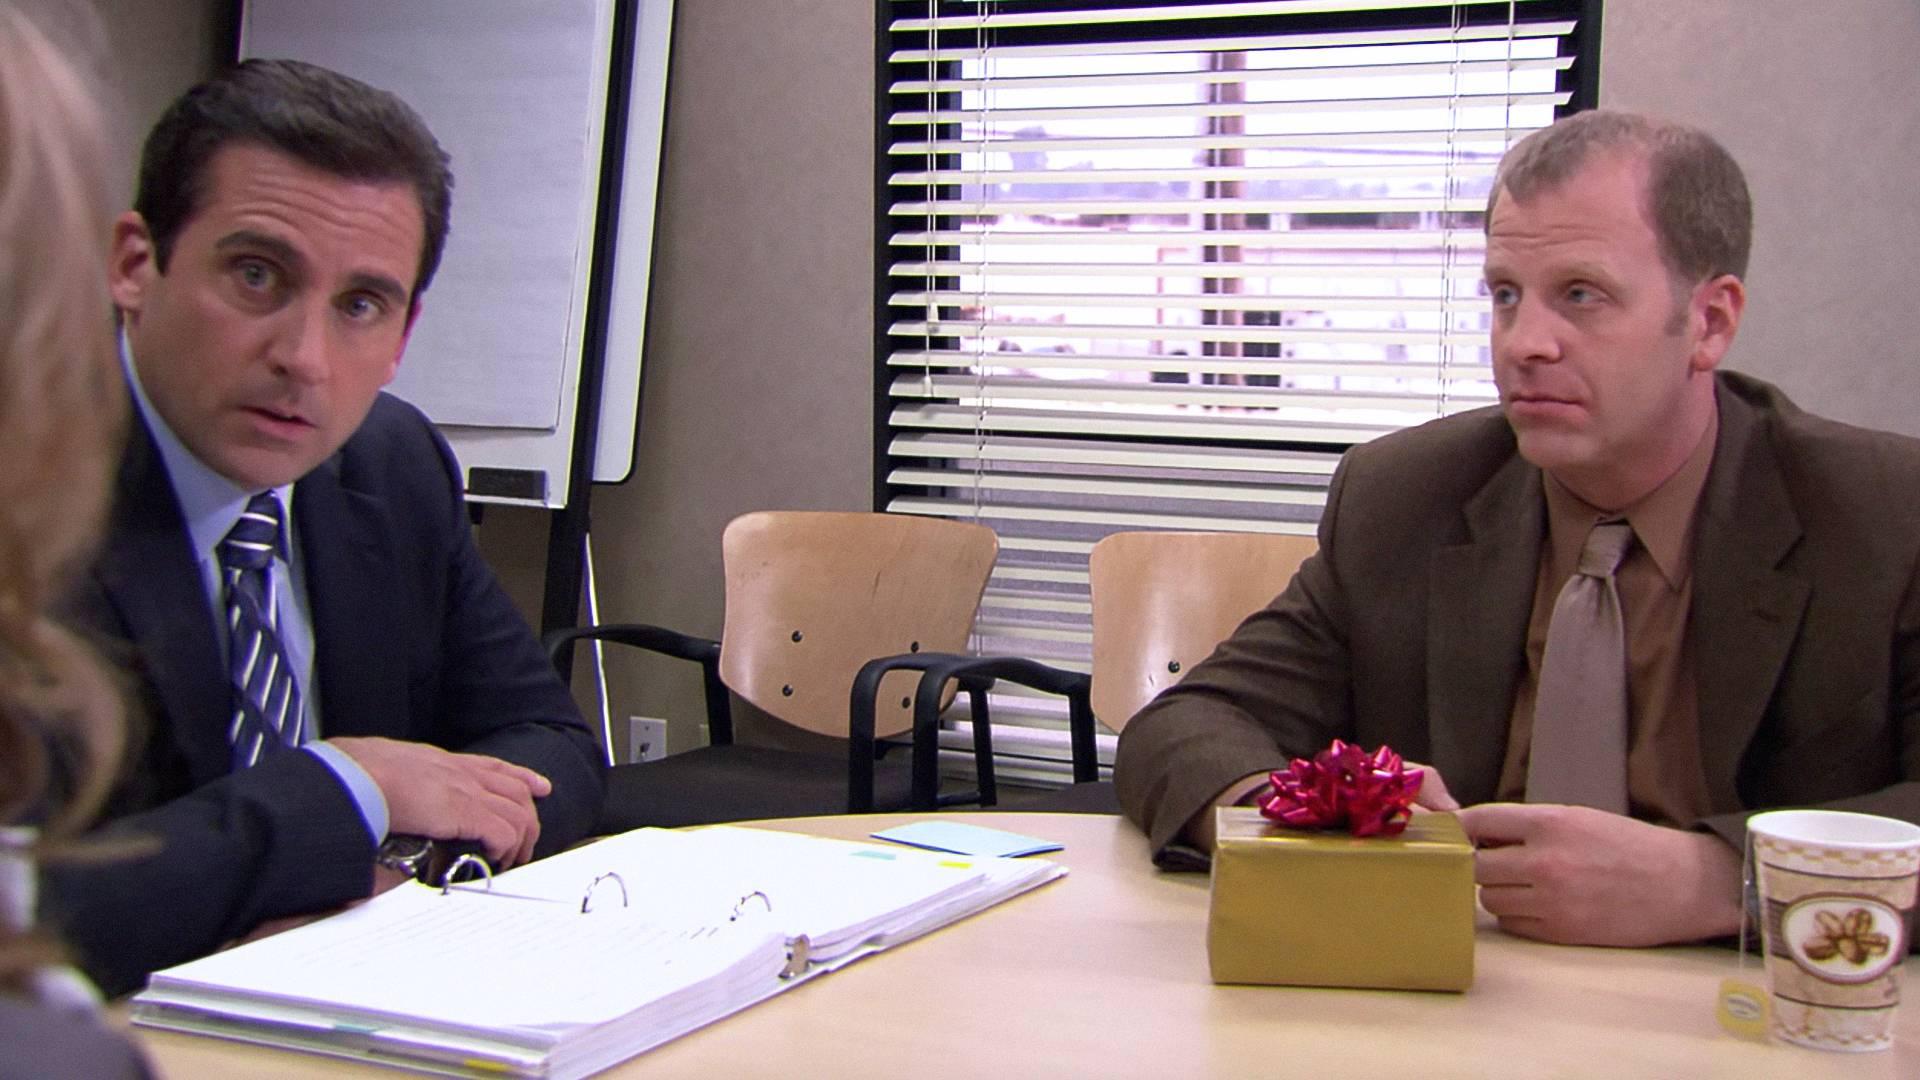 The Office Season 4 Episode 19